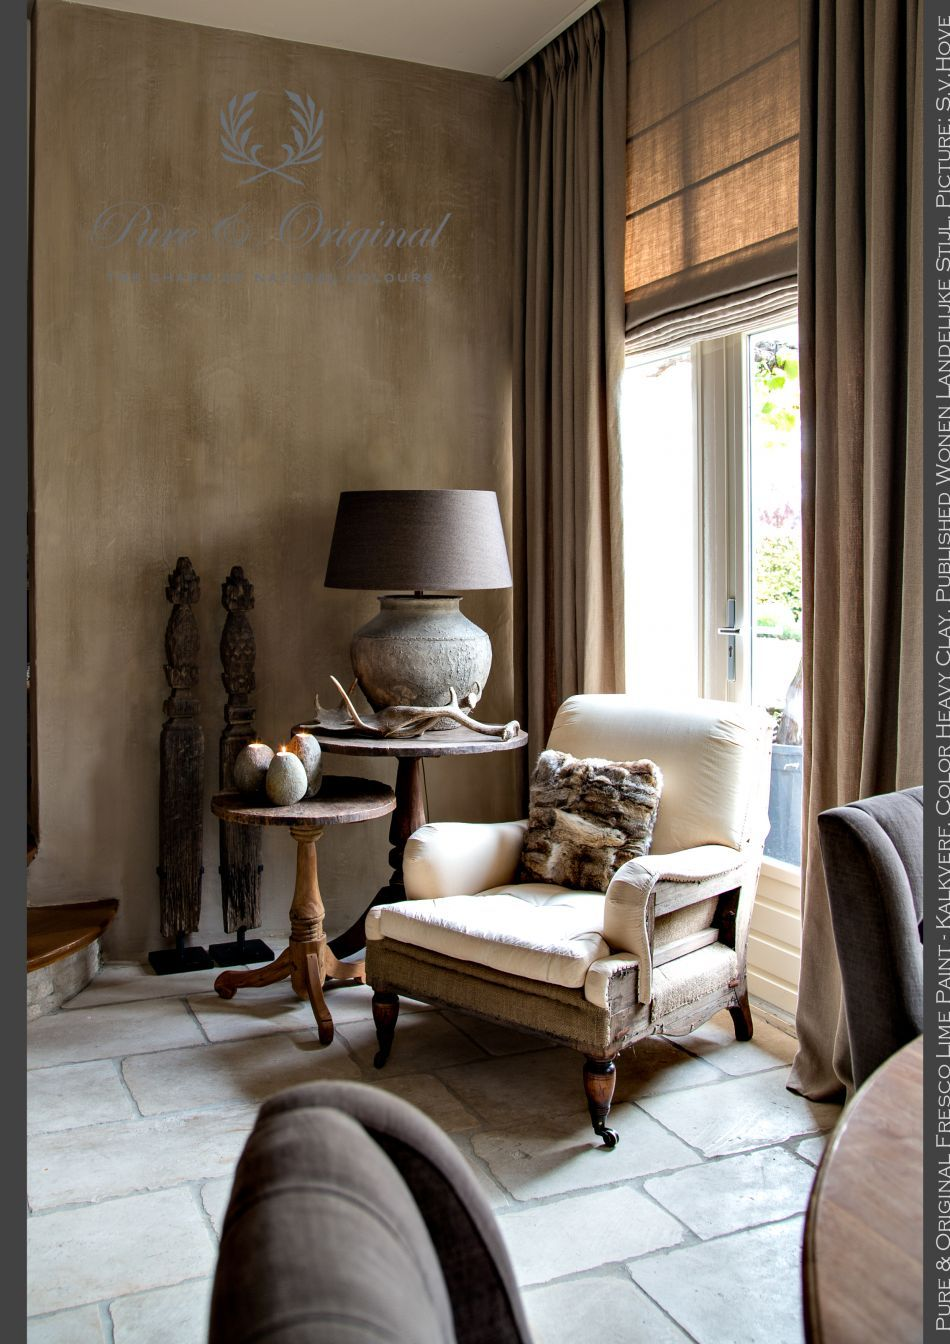 The official website of pure original pinterest - Innenausstattung wohnzimmer ...